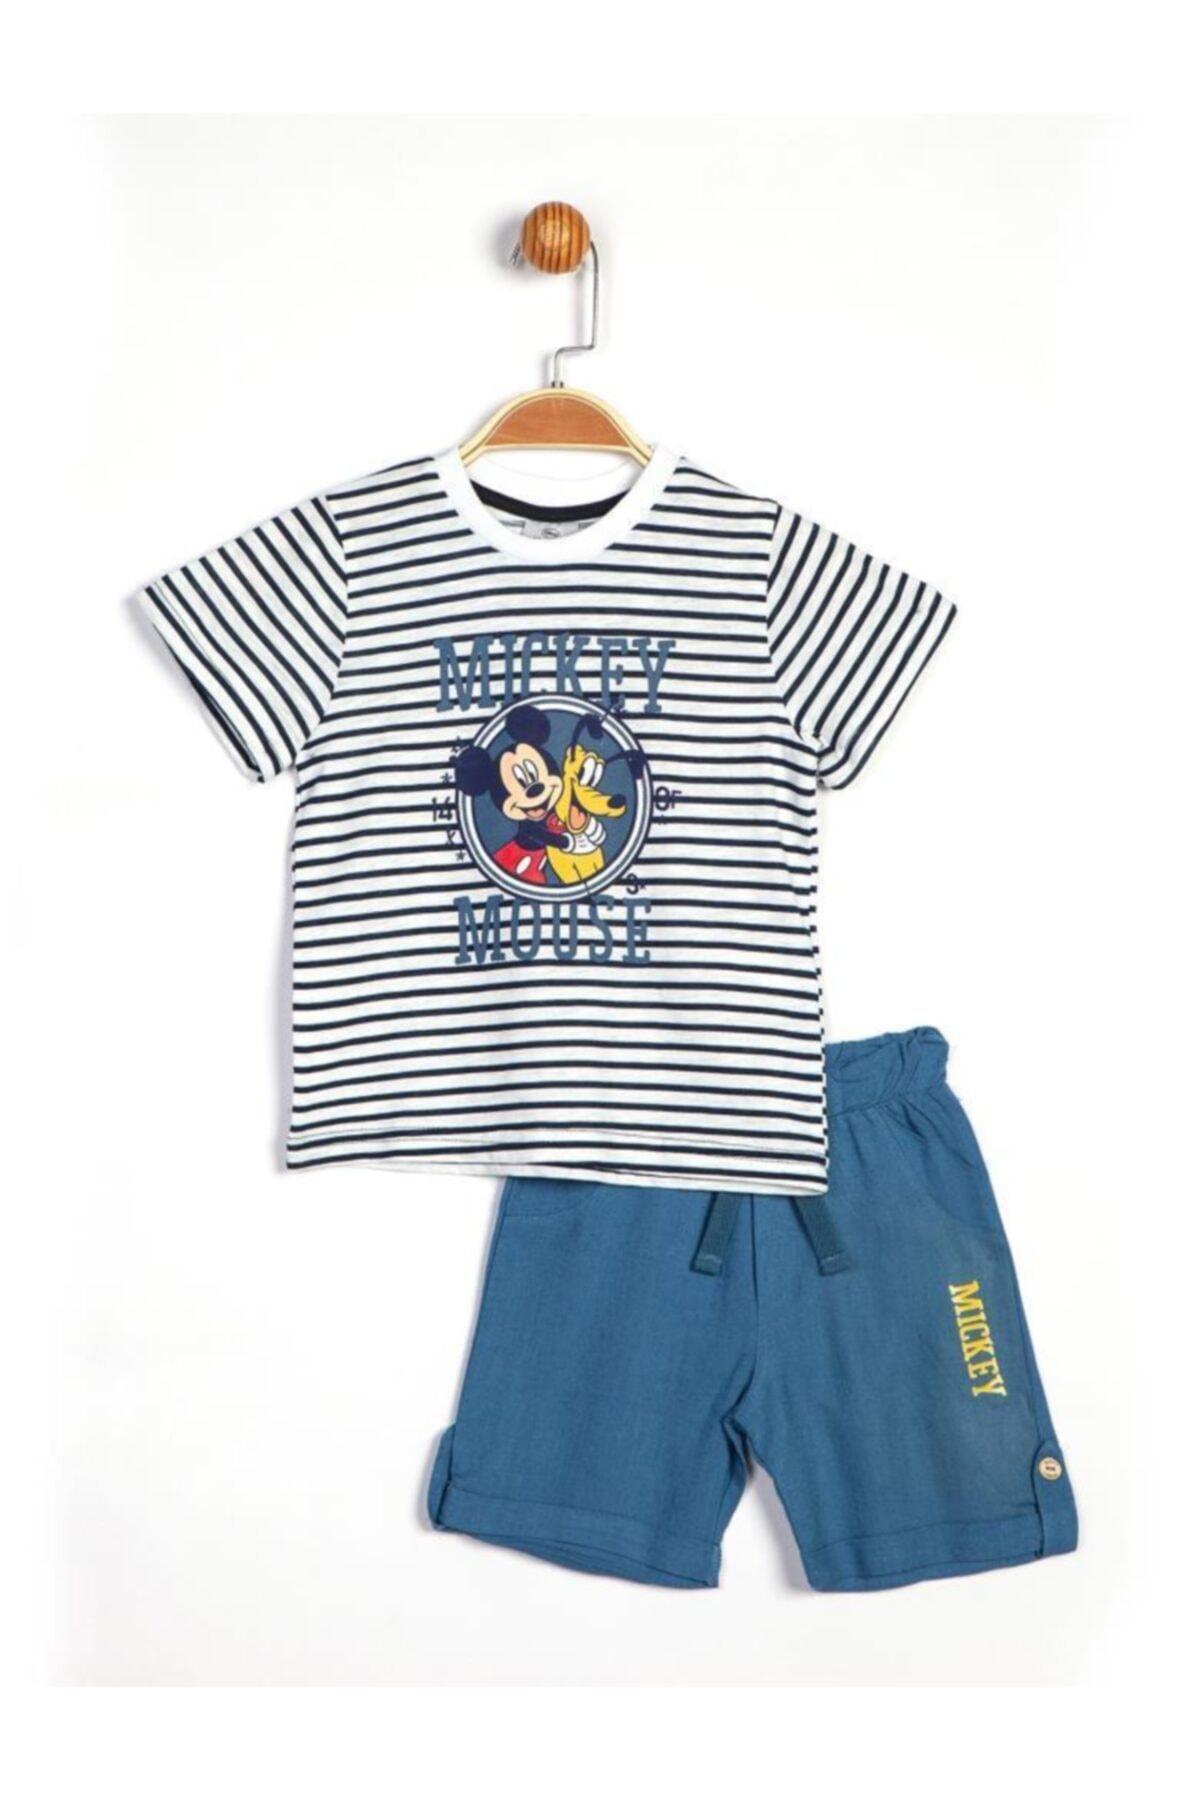 Mickey Mouse Disney Çocuk 2'li Takım 13899 1